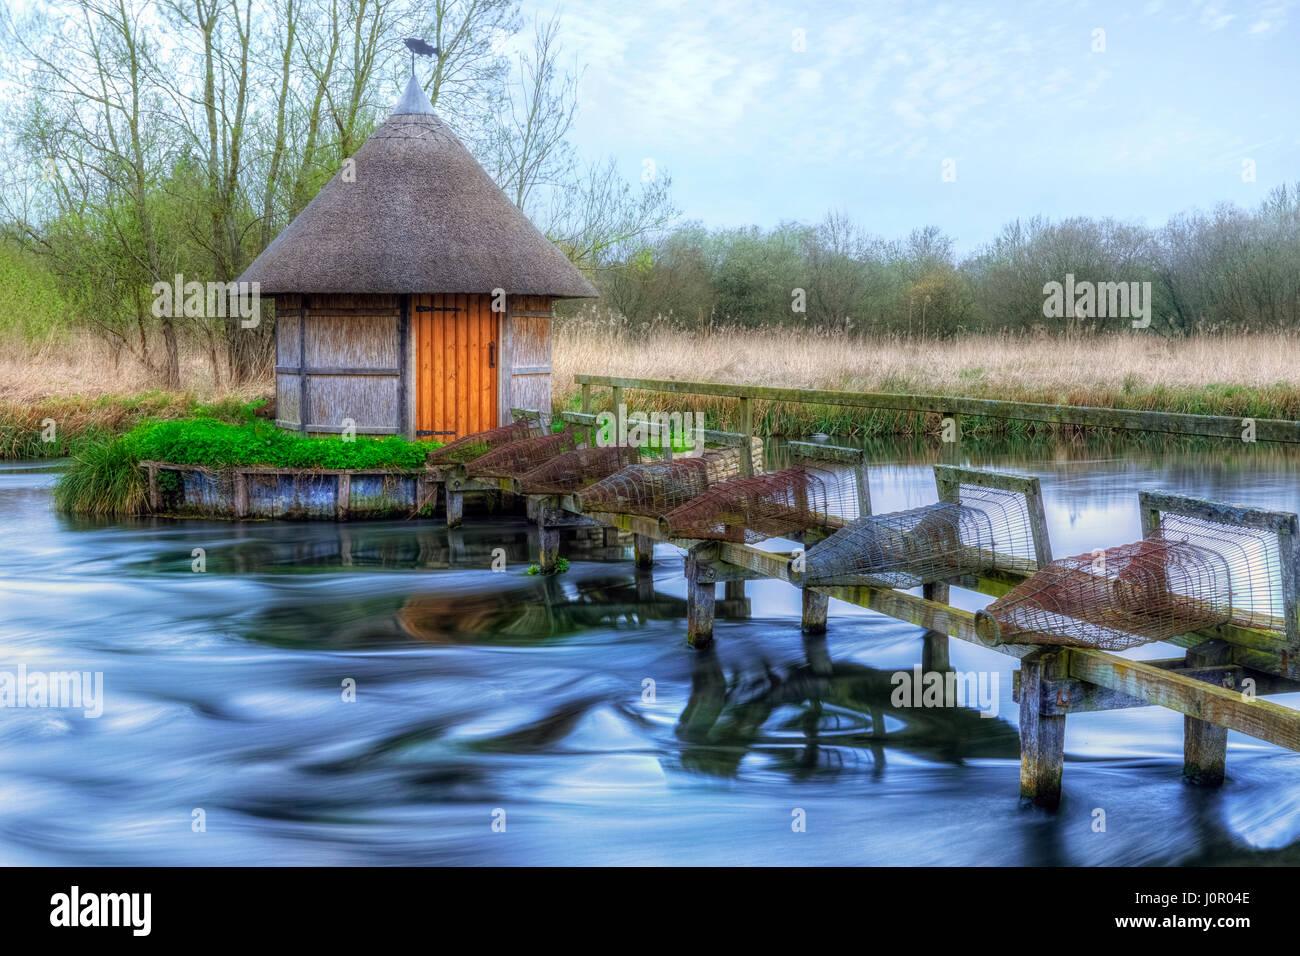 Fishing Hut at the river Test, Longstock, Hampshire, England, UK - Stock Image